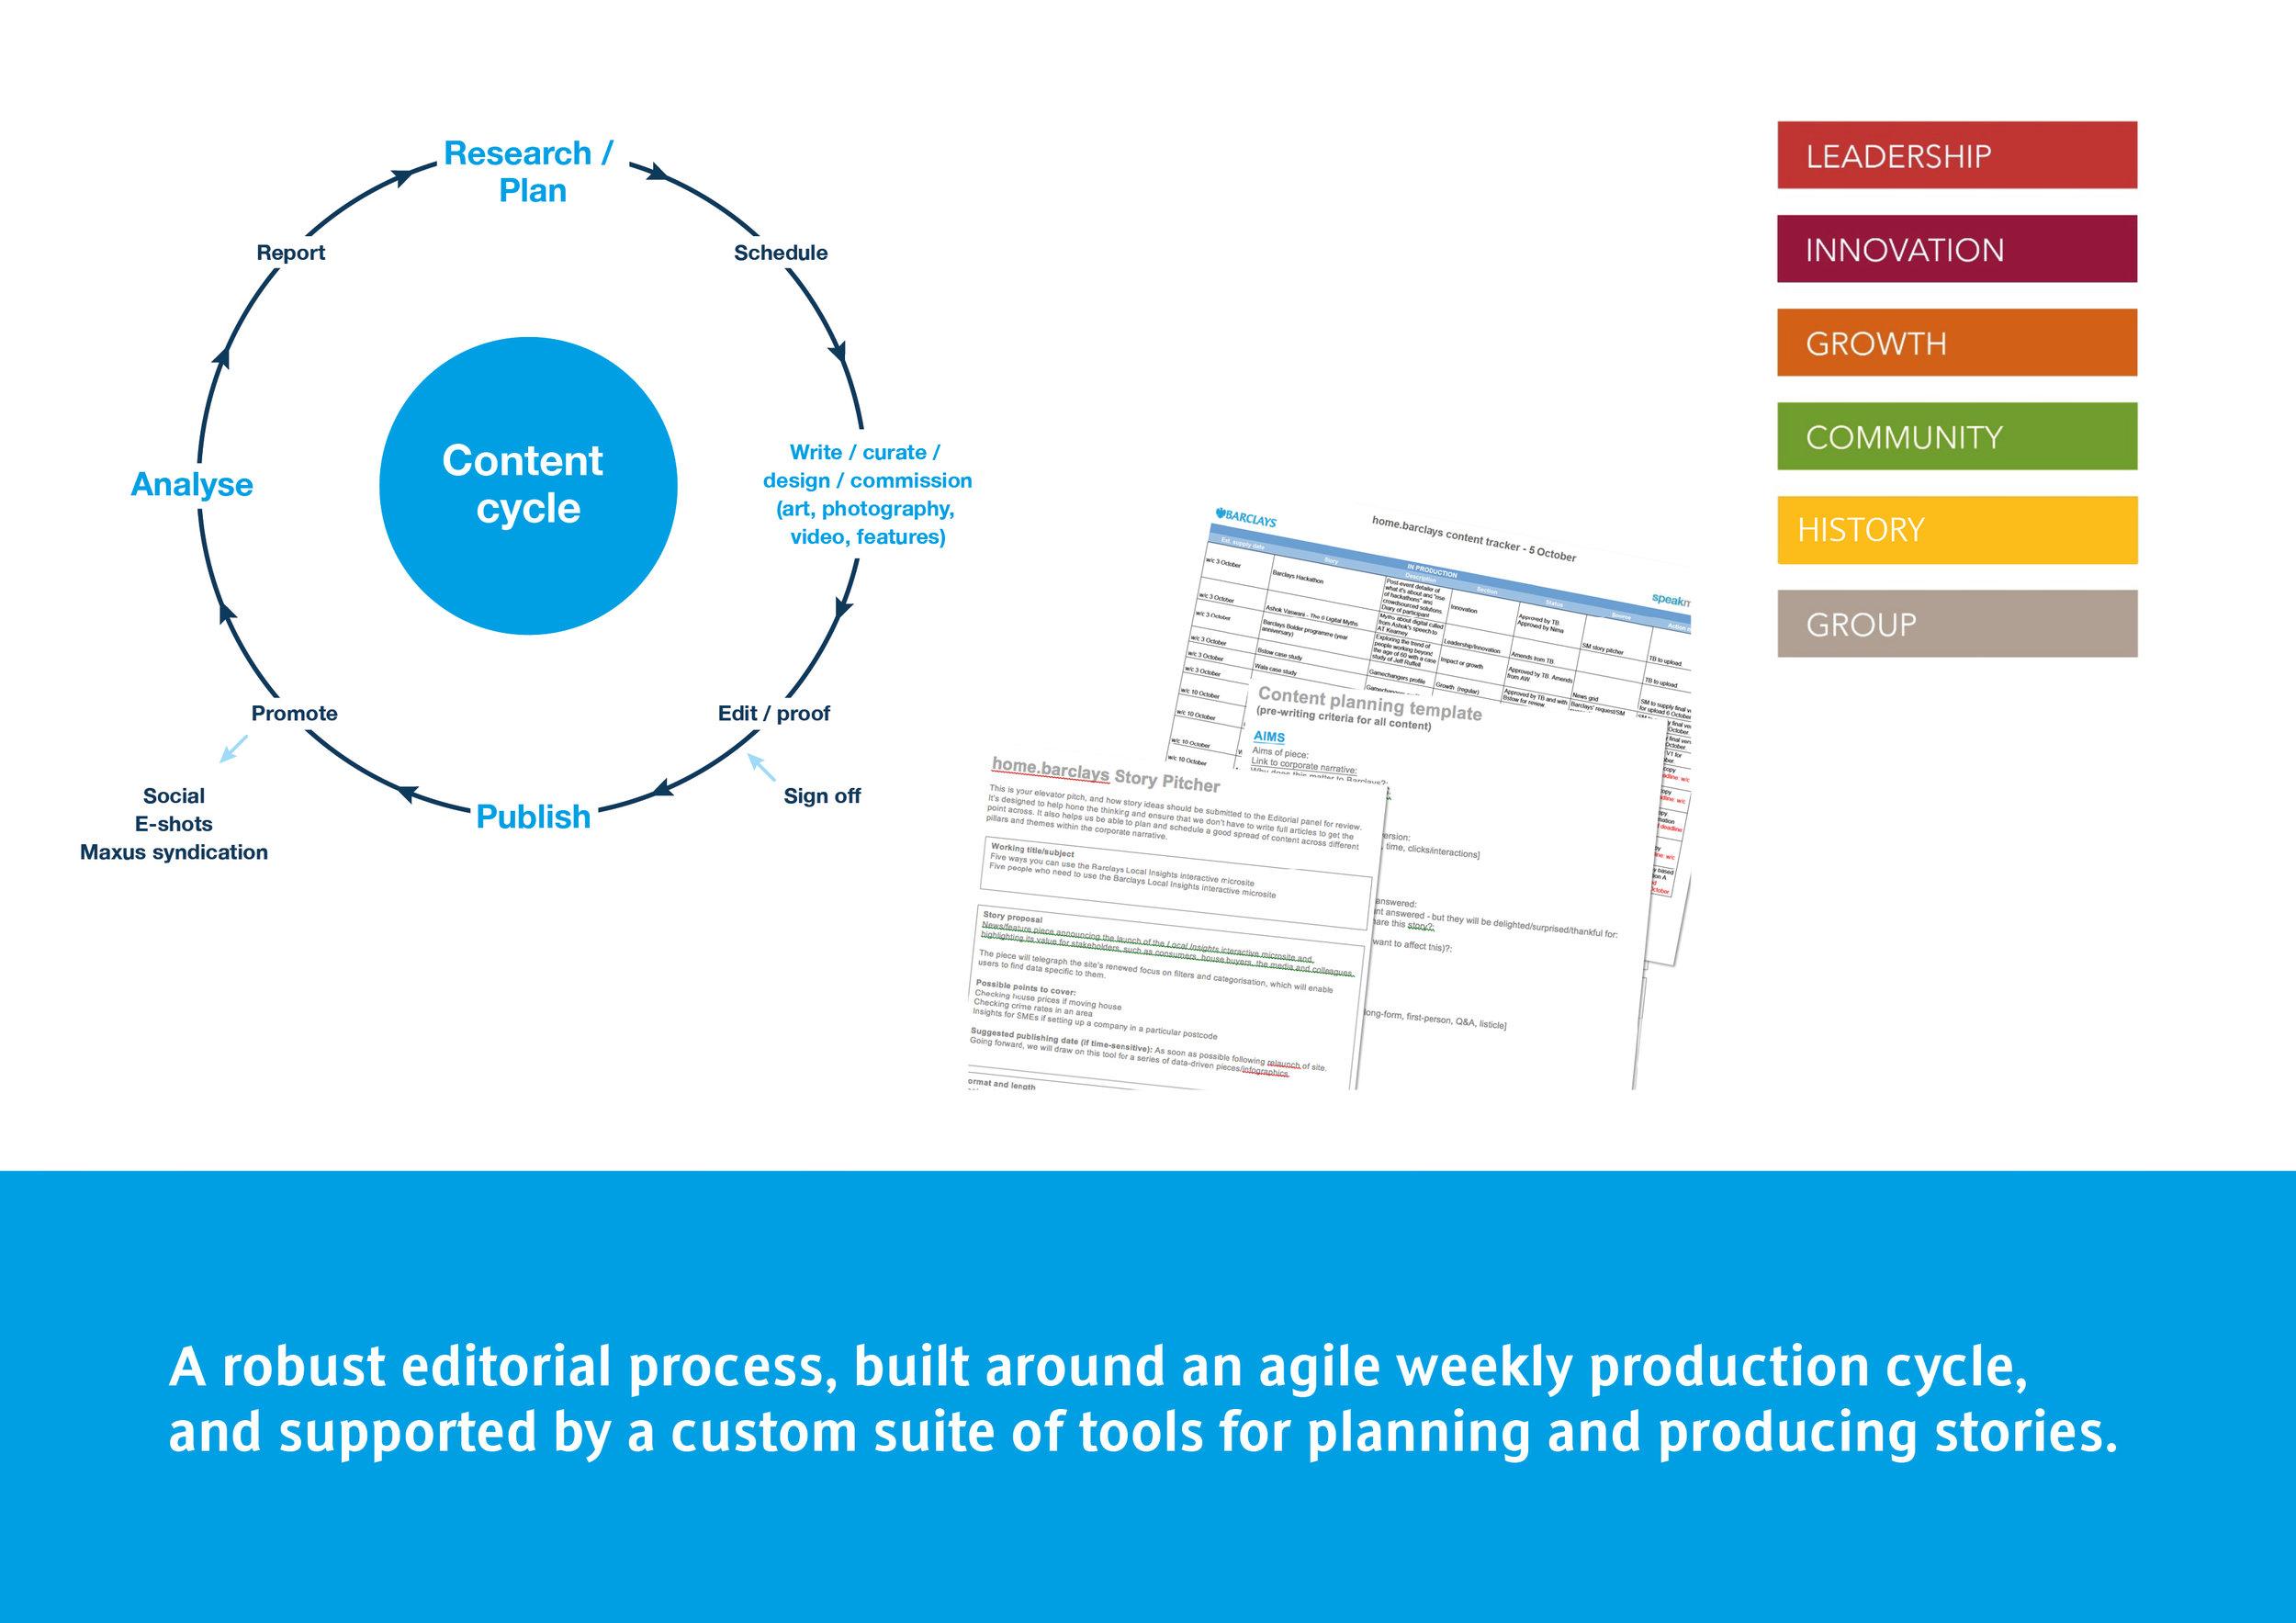 HOME.BARCLAYS processes-tools.jpg